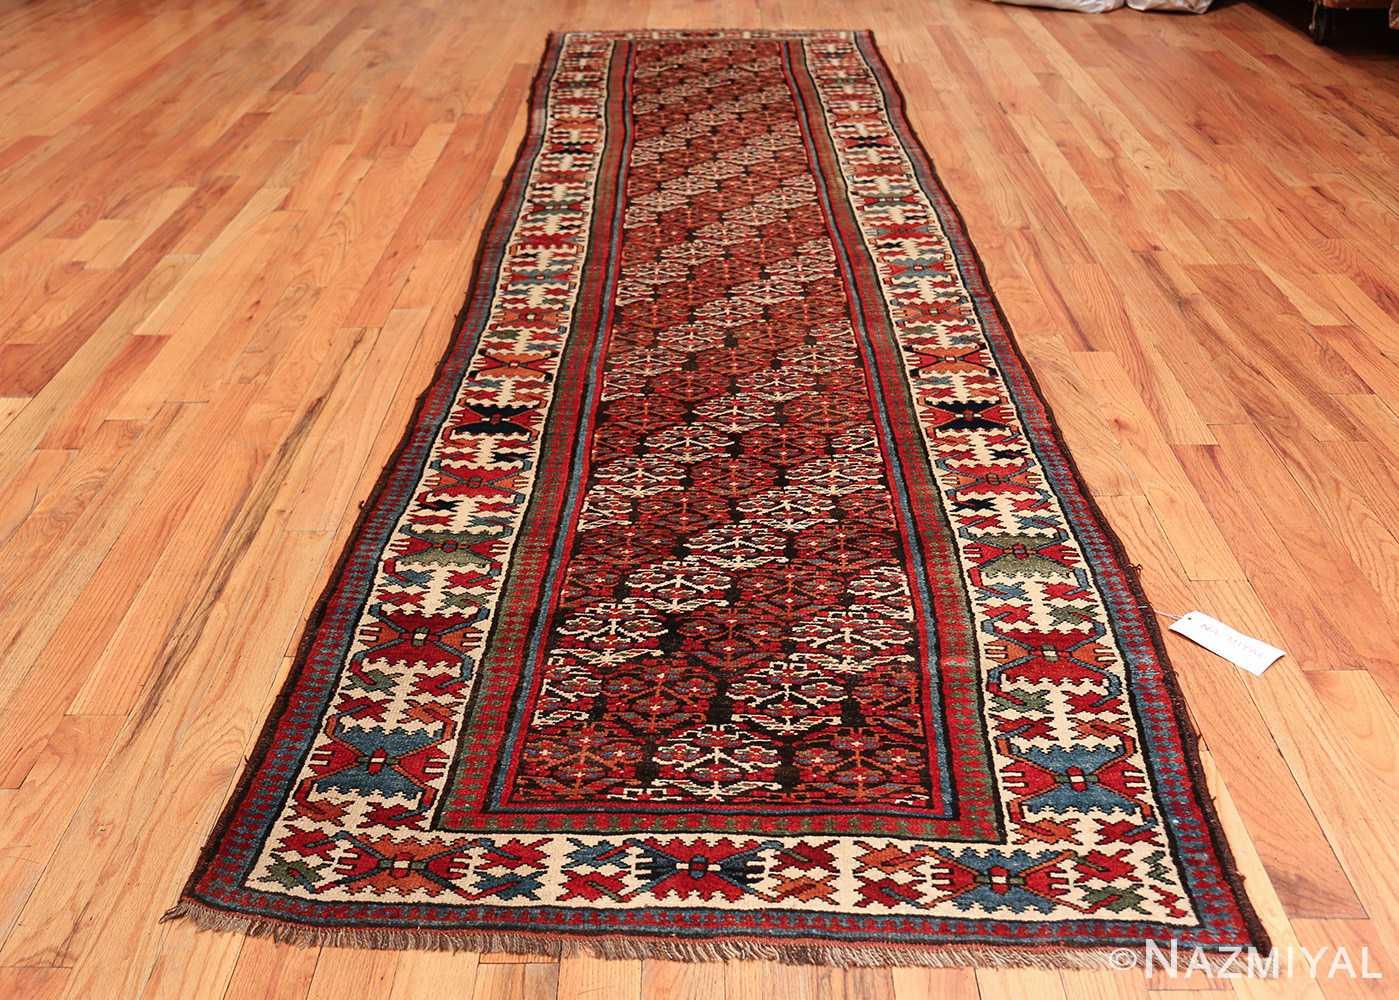 antique tribal northwest persian runner rug 50669 whole Nazmiyal